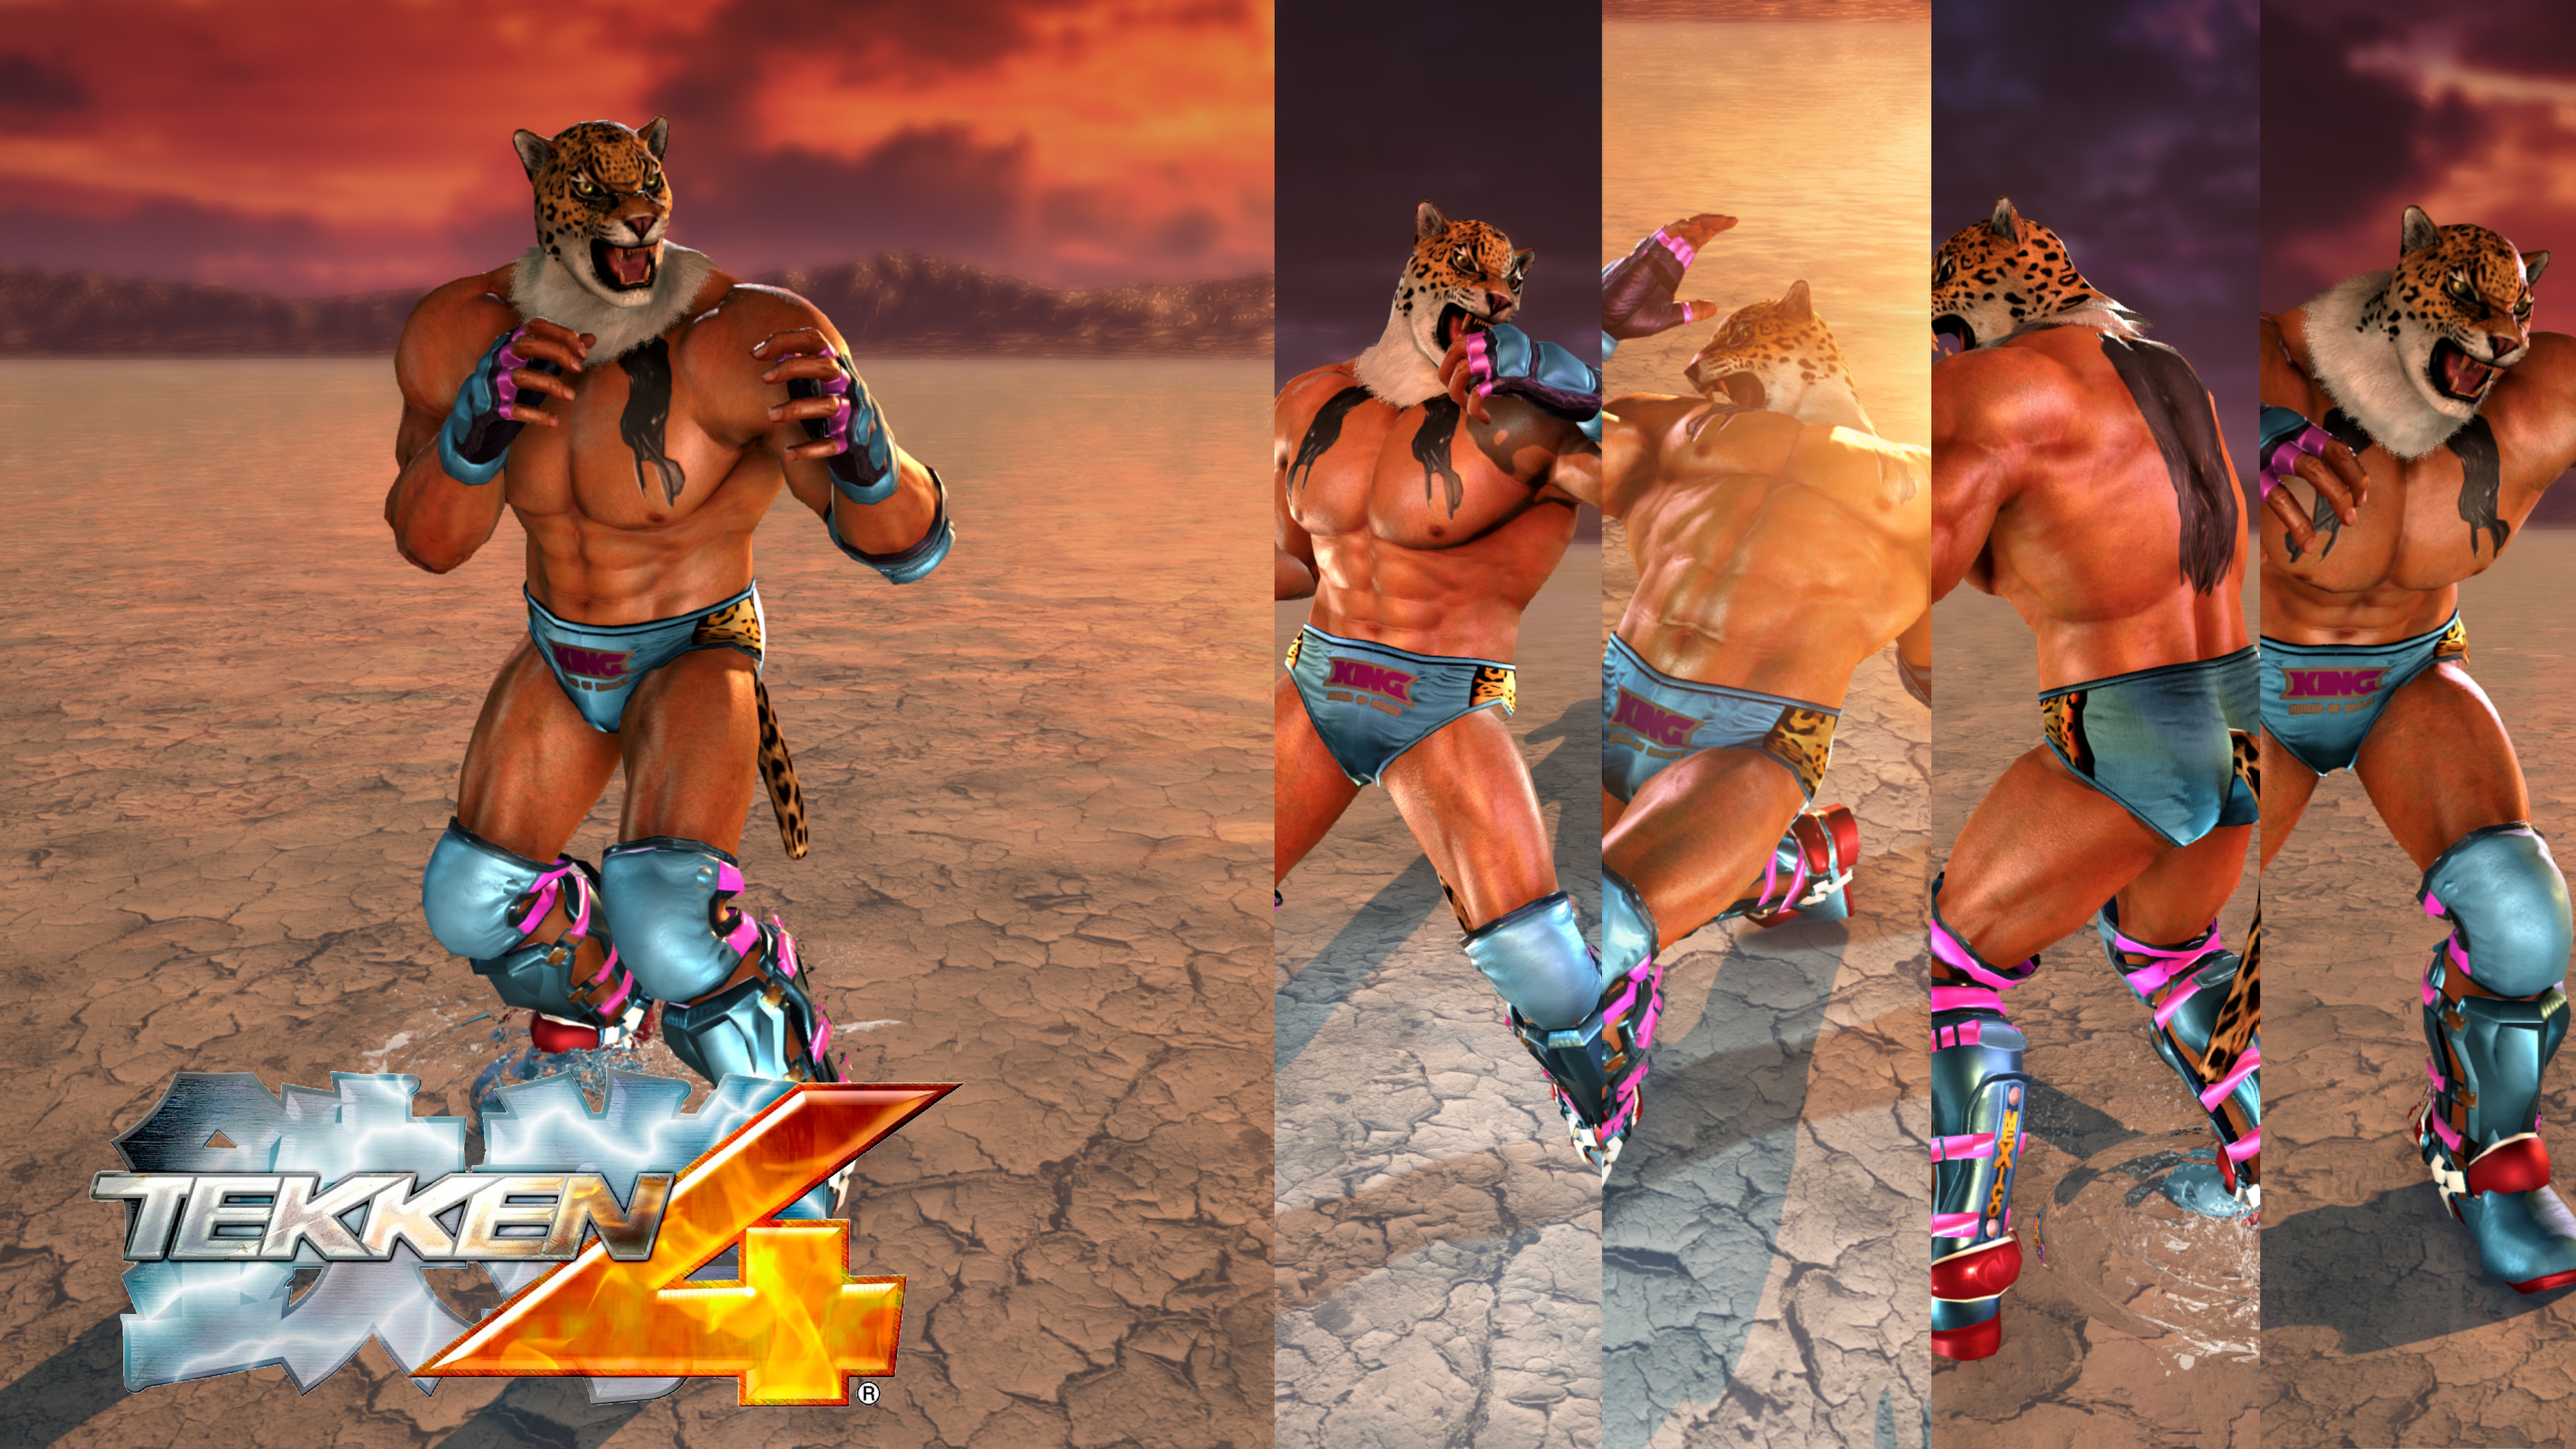 Tekken 4 Inspired King By Thei3arracuda On Deviantart